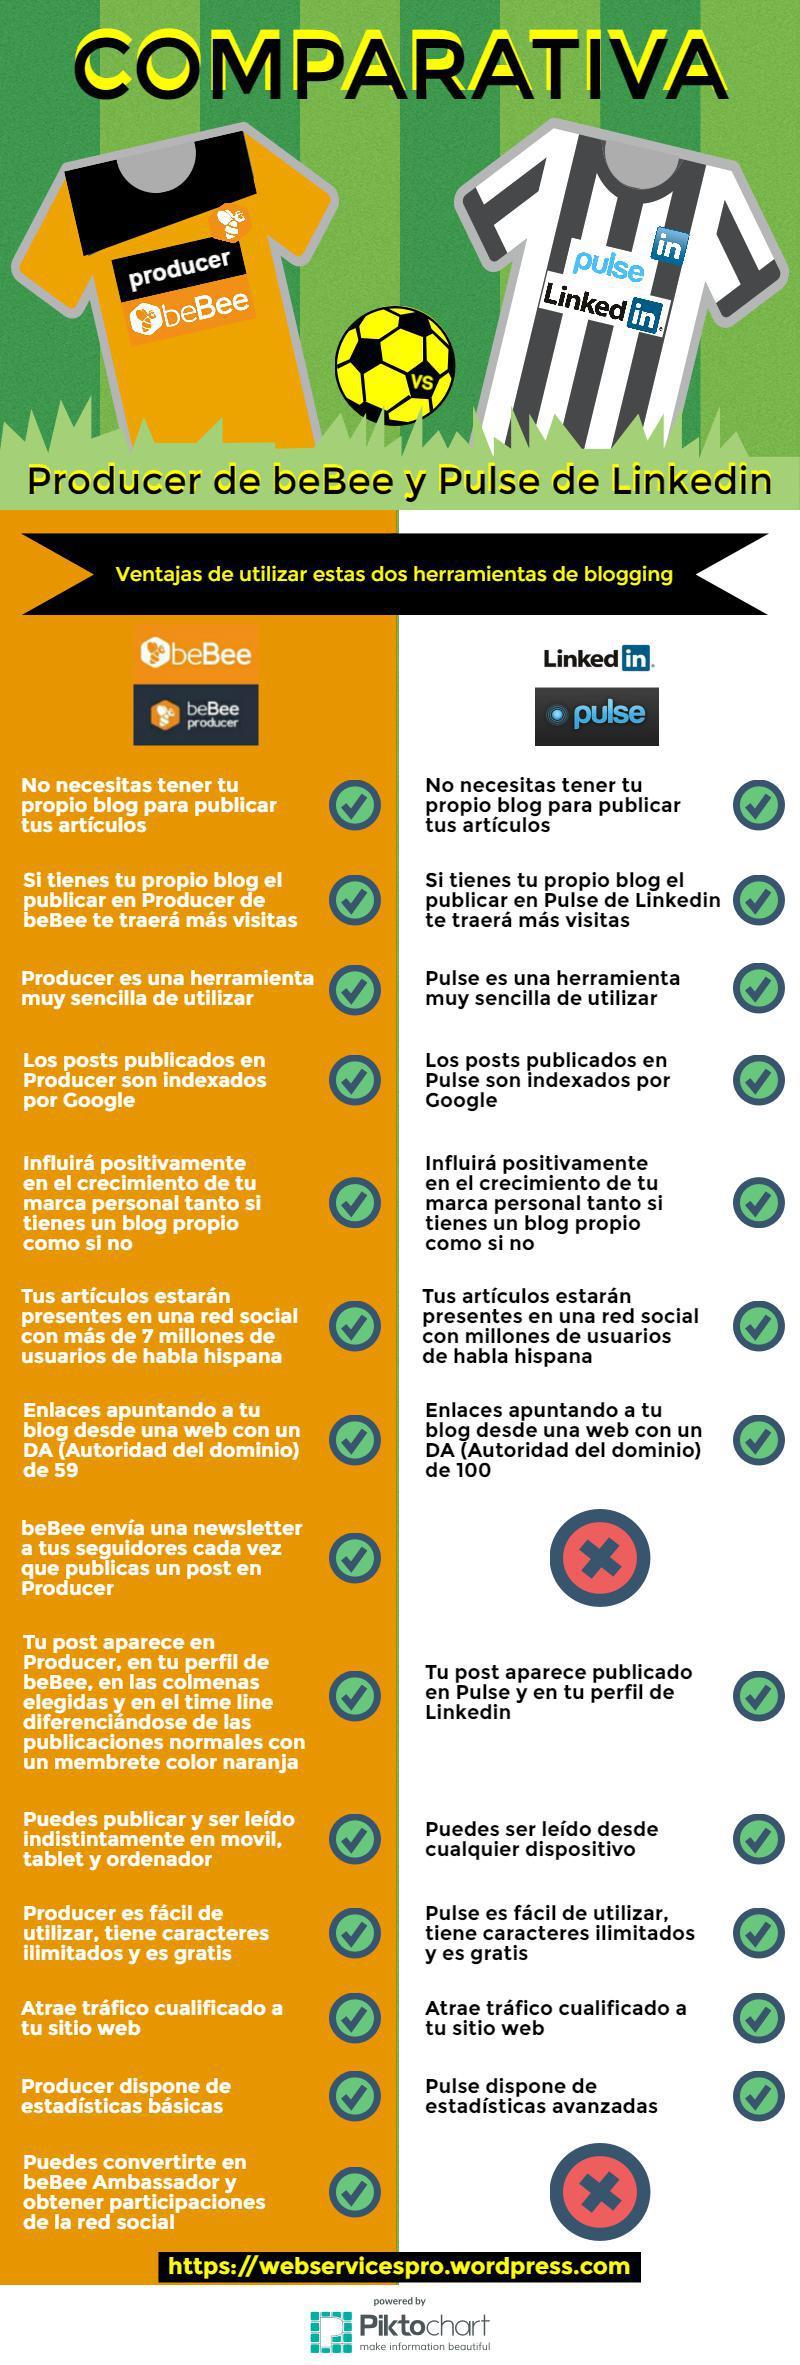 Producer de BeBee vs Pulse de LinkedIn #infografia #infographic #socialmedia